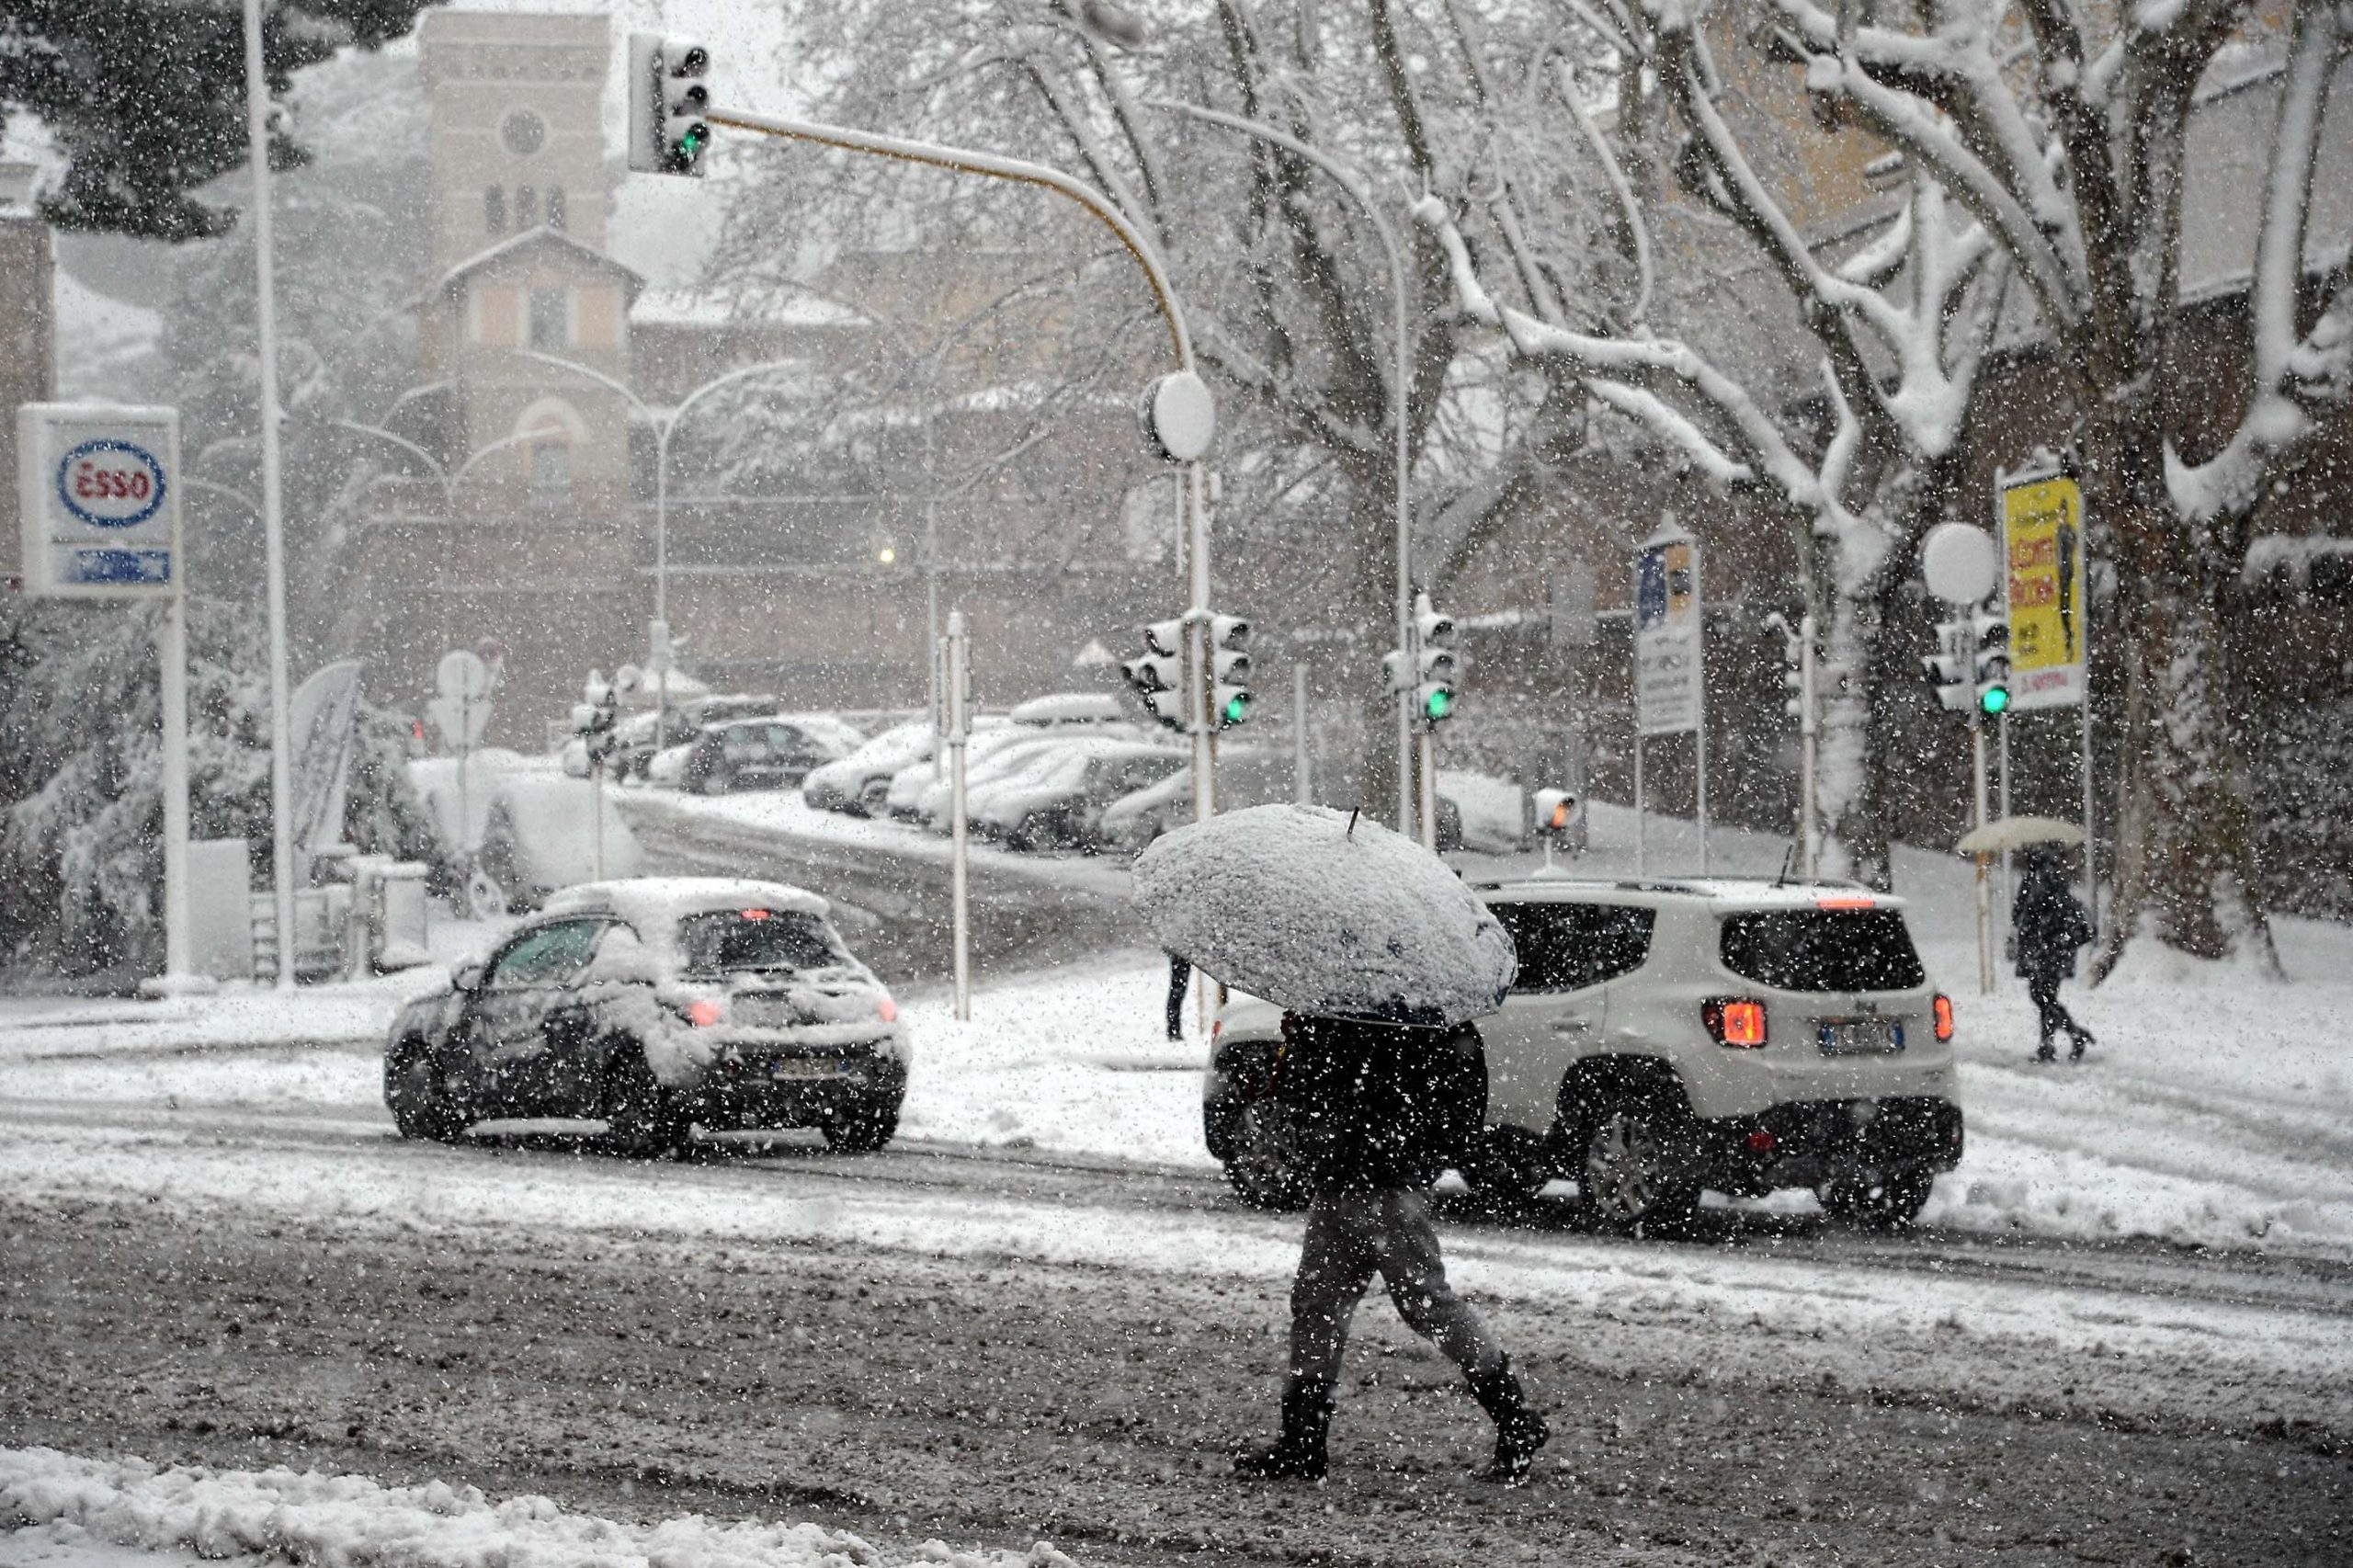 Meteo inverno 2022